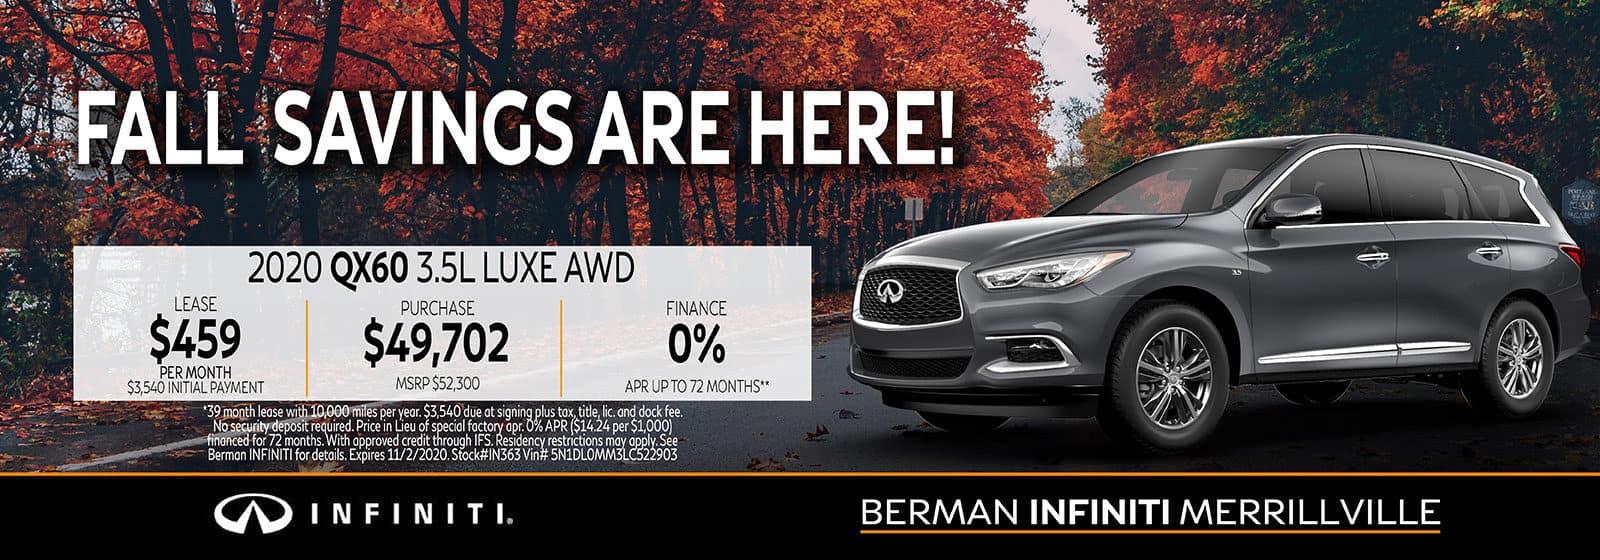 New 2020 INFINITI QX60 October Offer at Berman INFINITI of Merrillville!